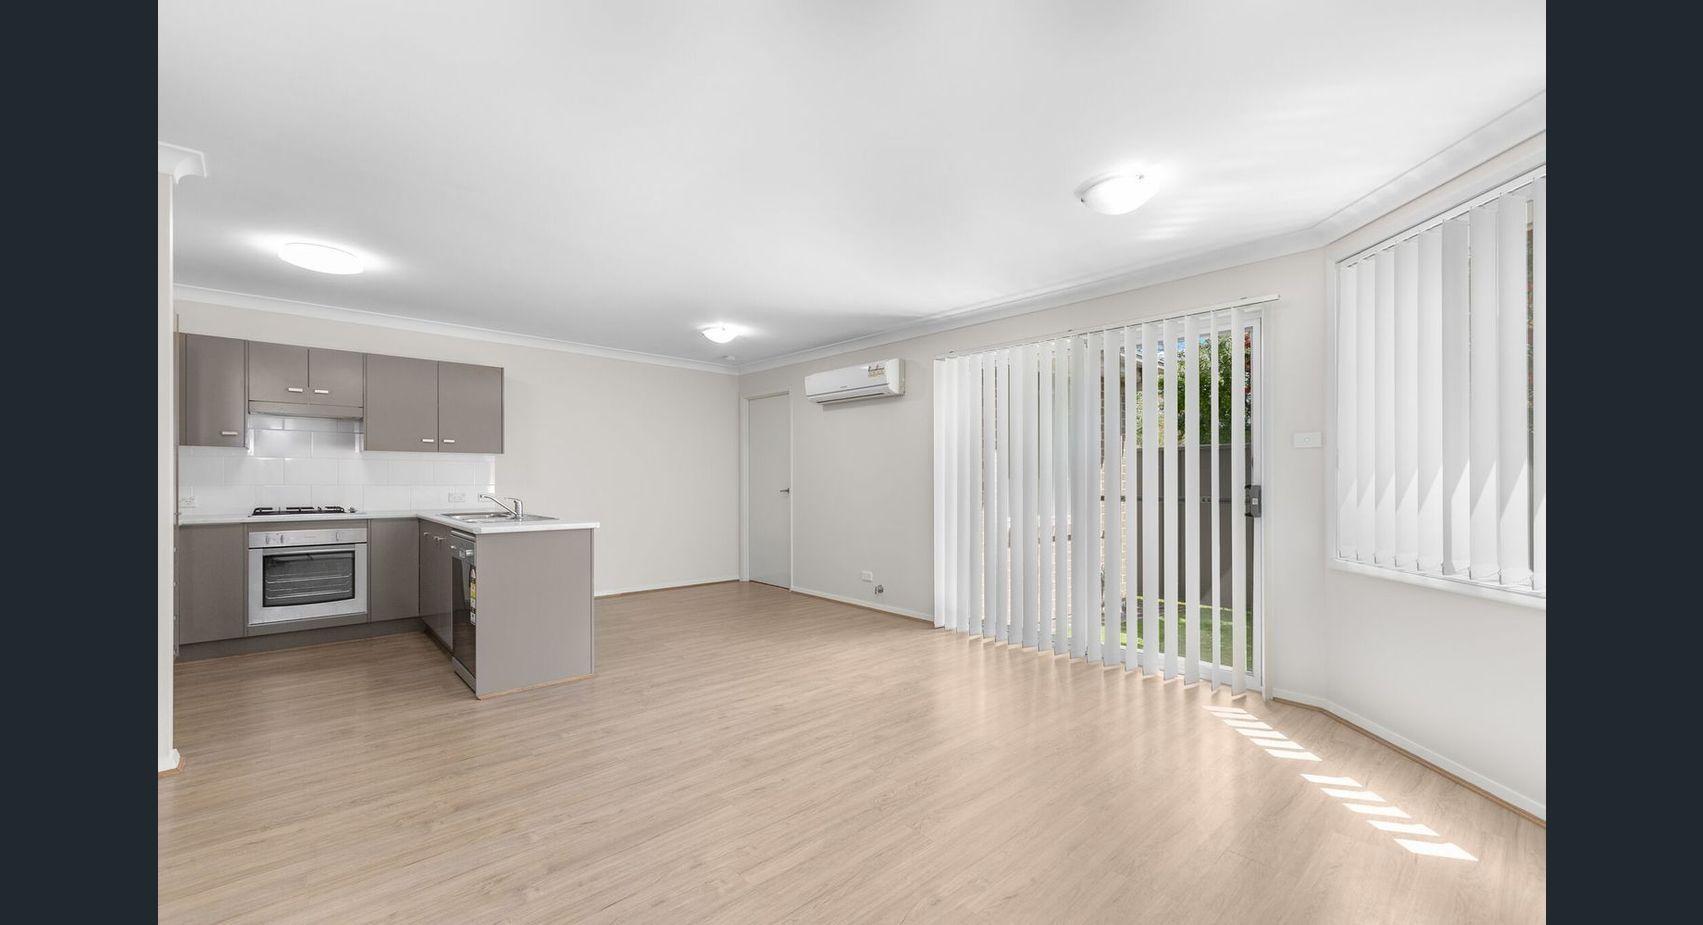 3/17a Raymond Terrace Road, East Maitland NSW 2323, Image 1